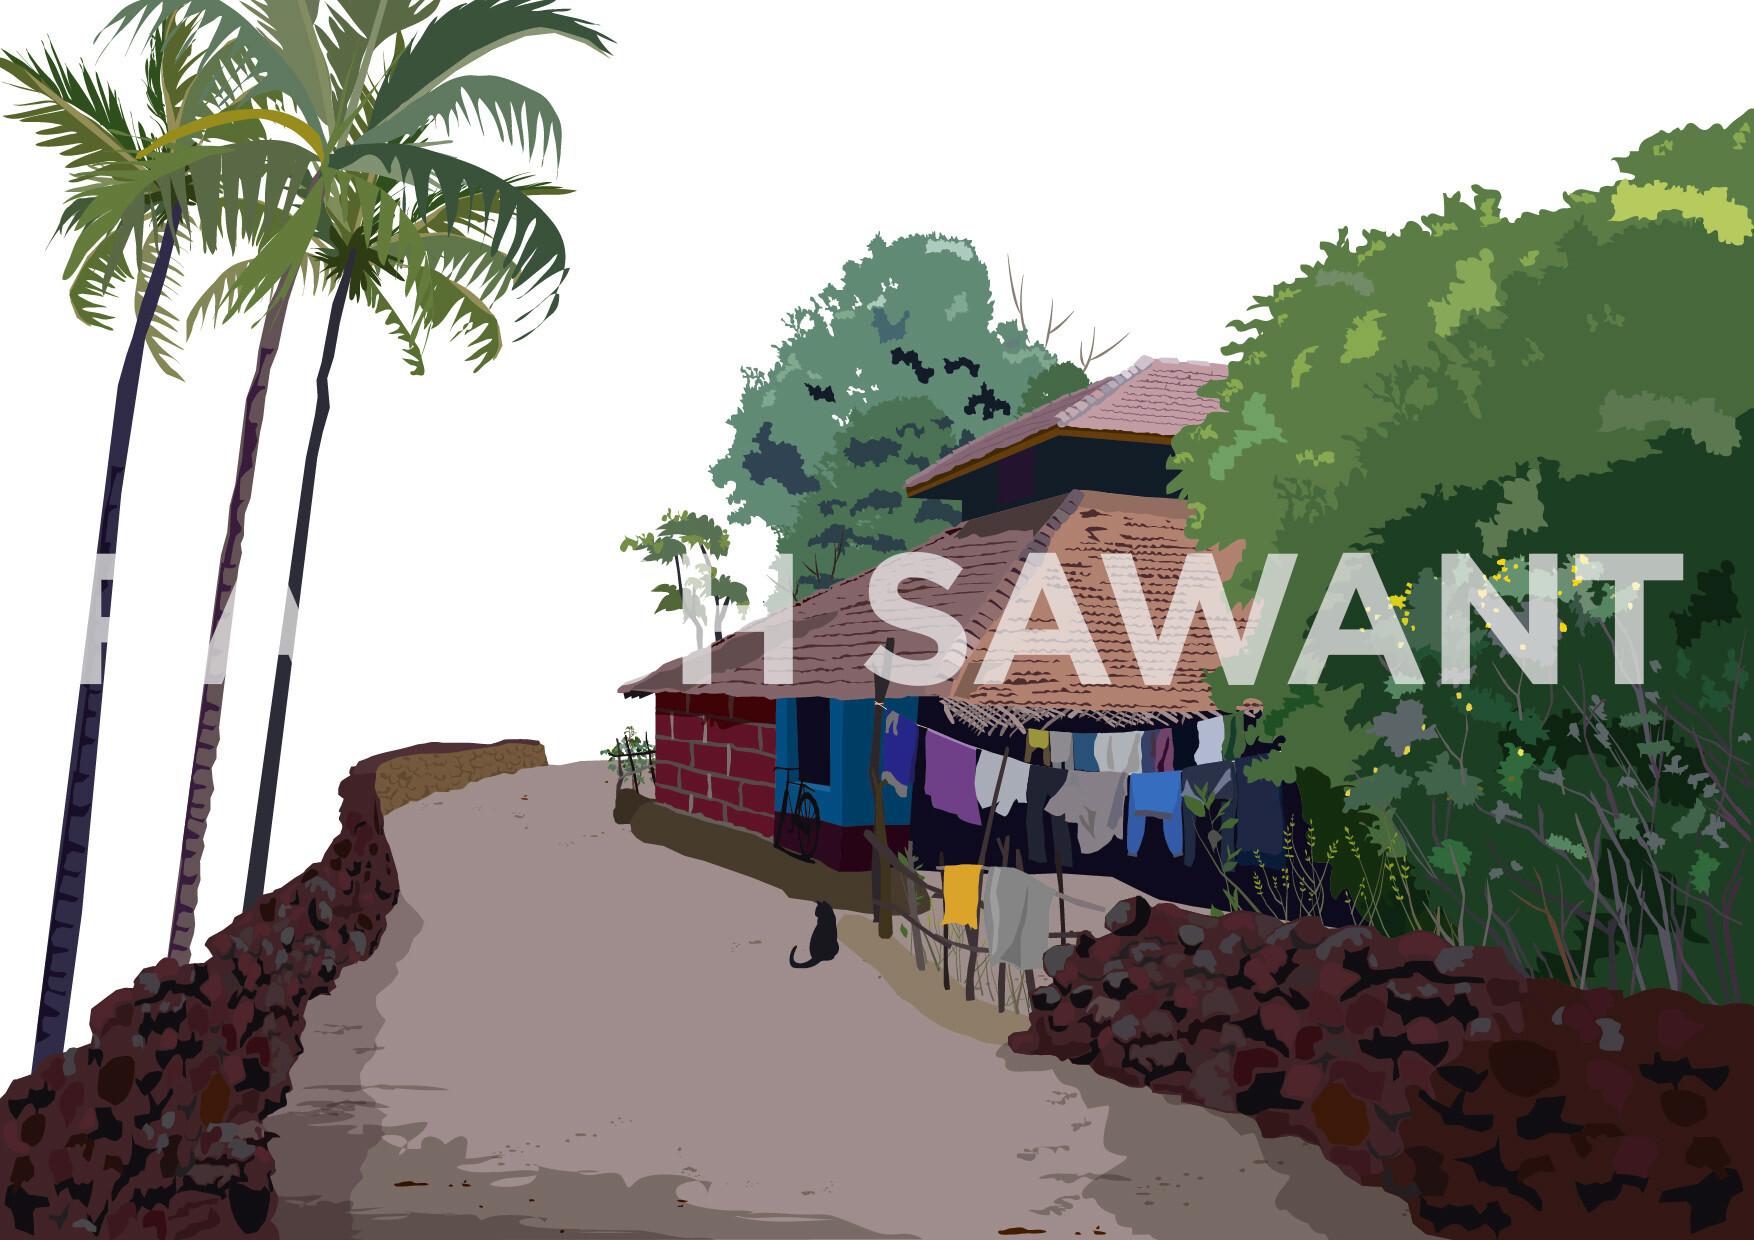 Rajesh r sawant rajesh sawant konkan house vadkol2 01water